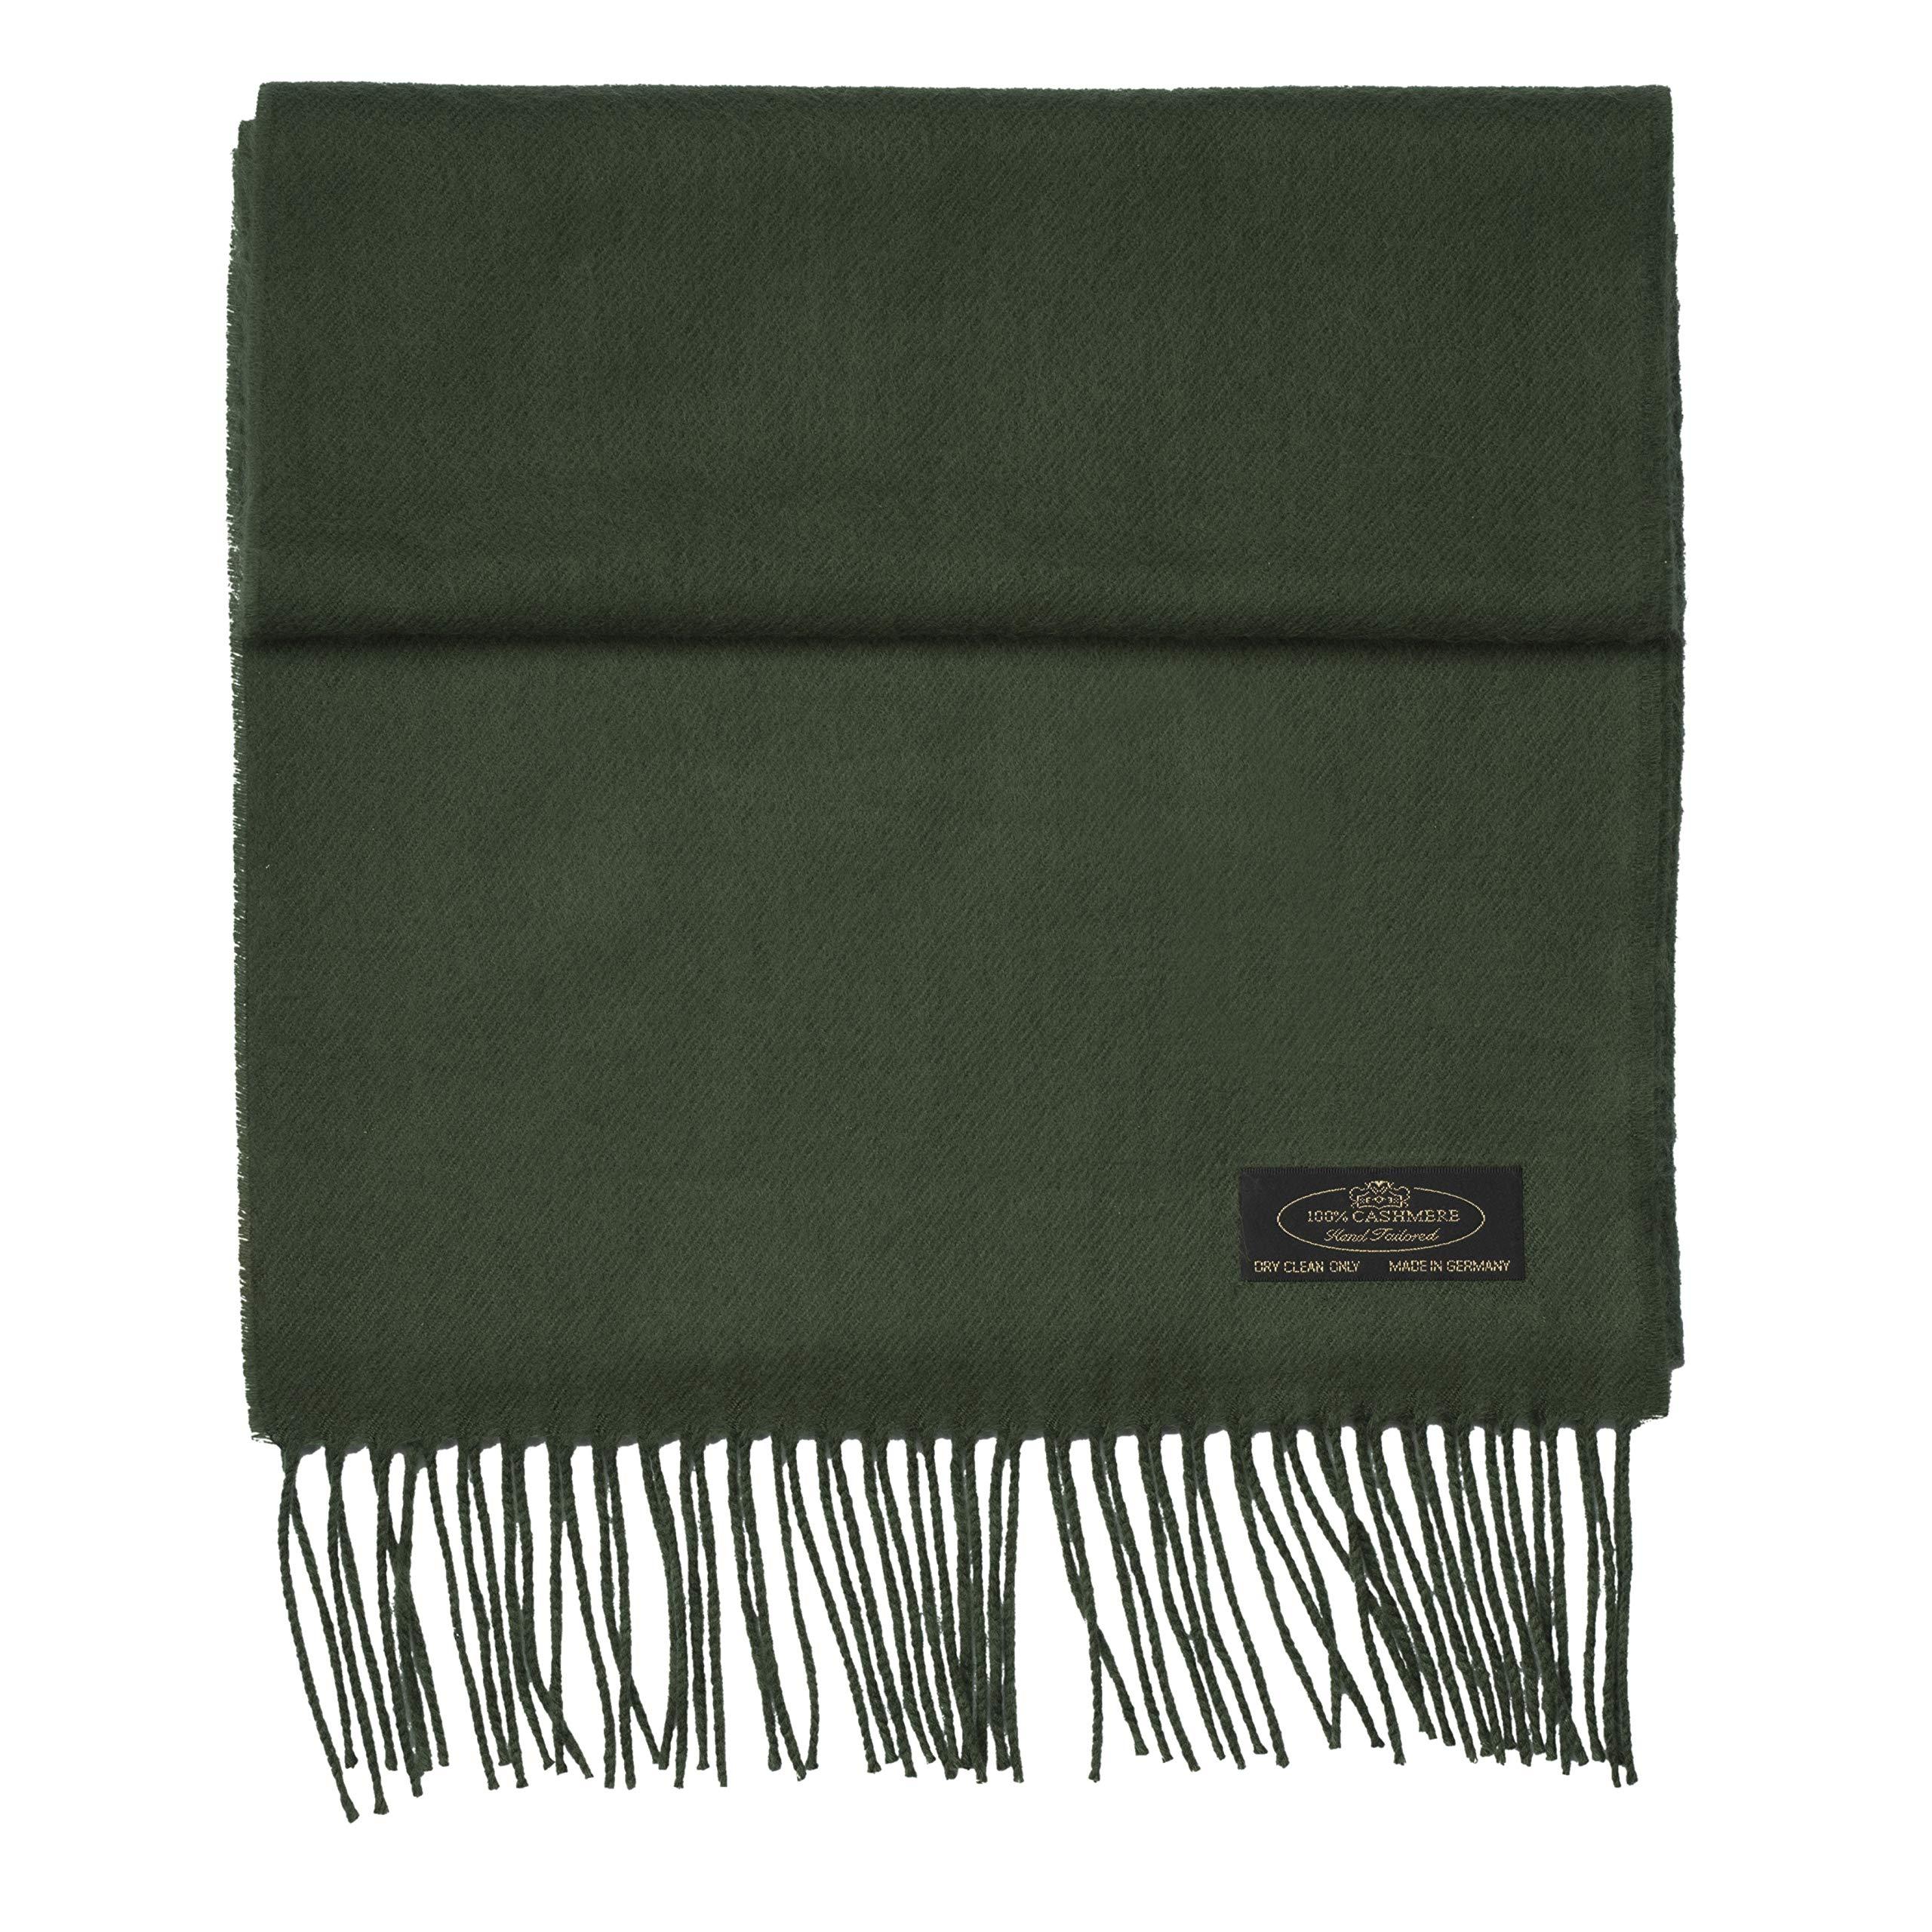 100% Cashmere Scarf Super Soft For Men And Women Warm Cozy Scarves Multiple Colors FHC Enterprize (Forest Green)